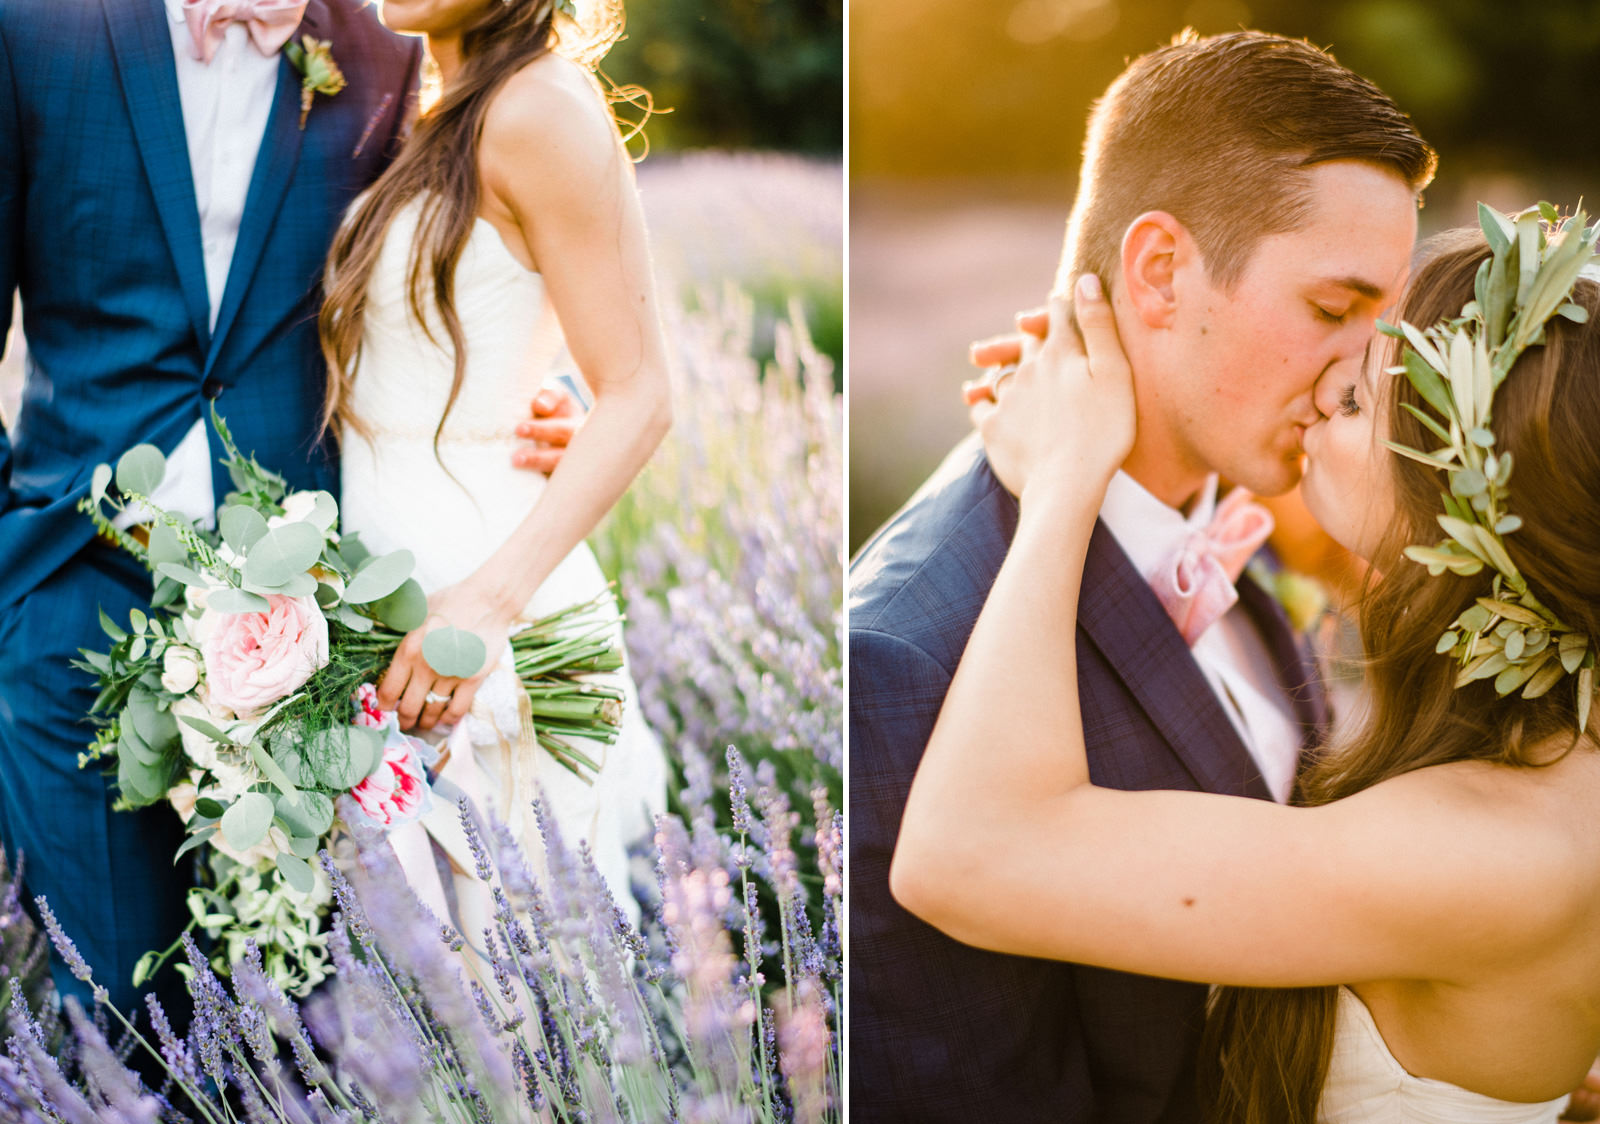 099-woodinville-lavendar-farm-wedding-with-golden-glowy-photos.jpg